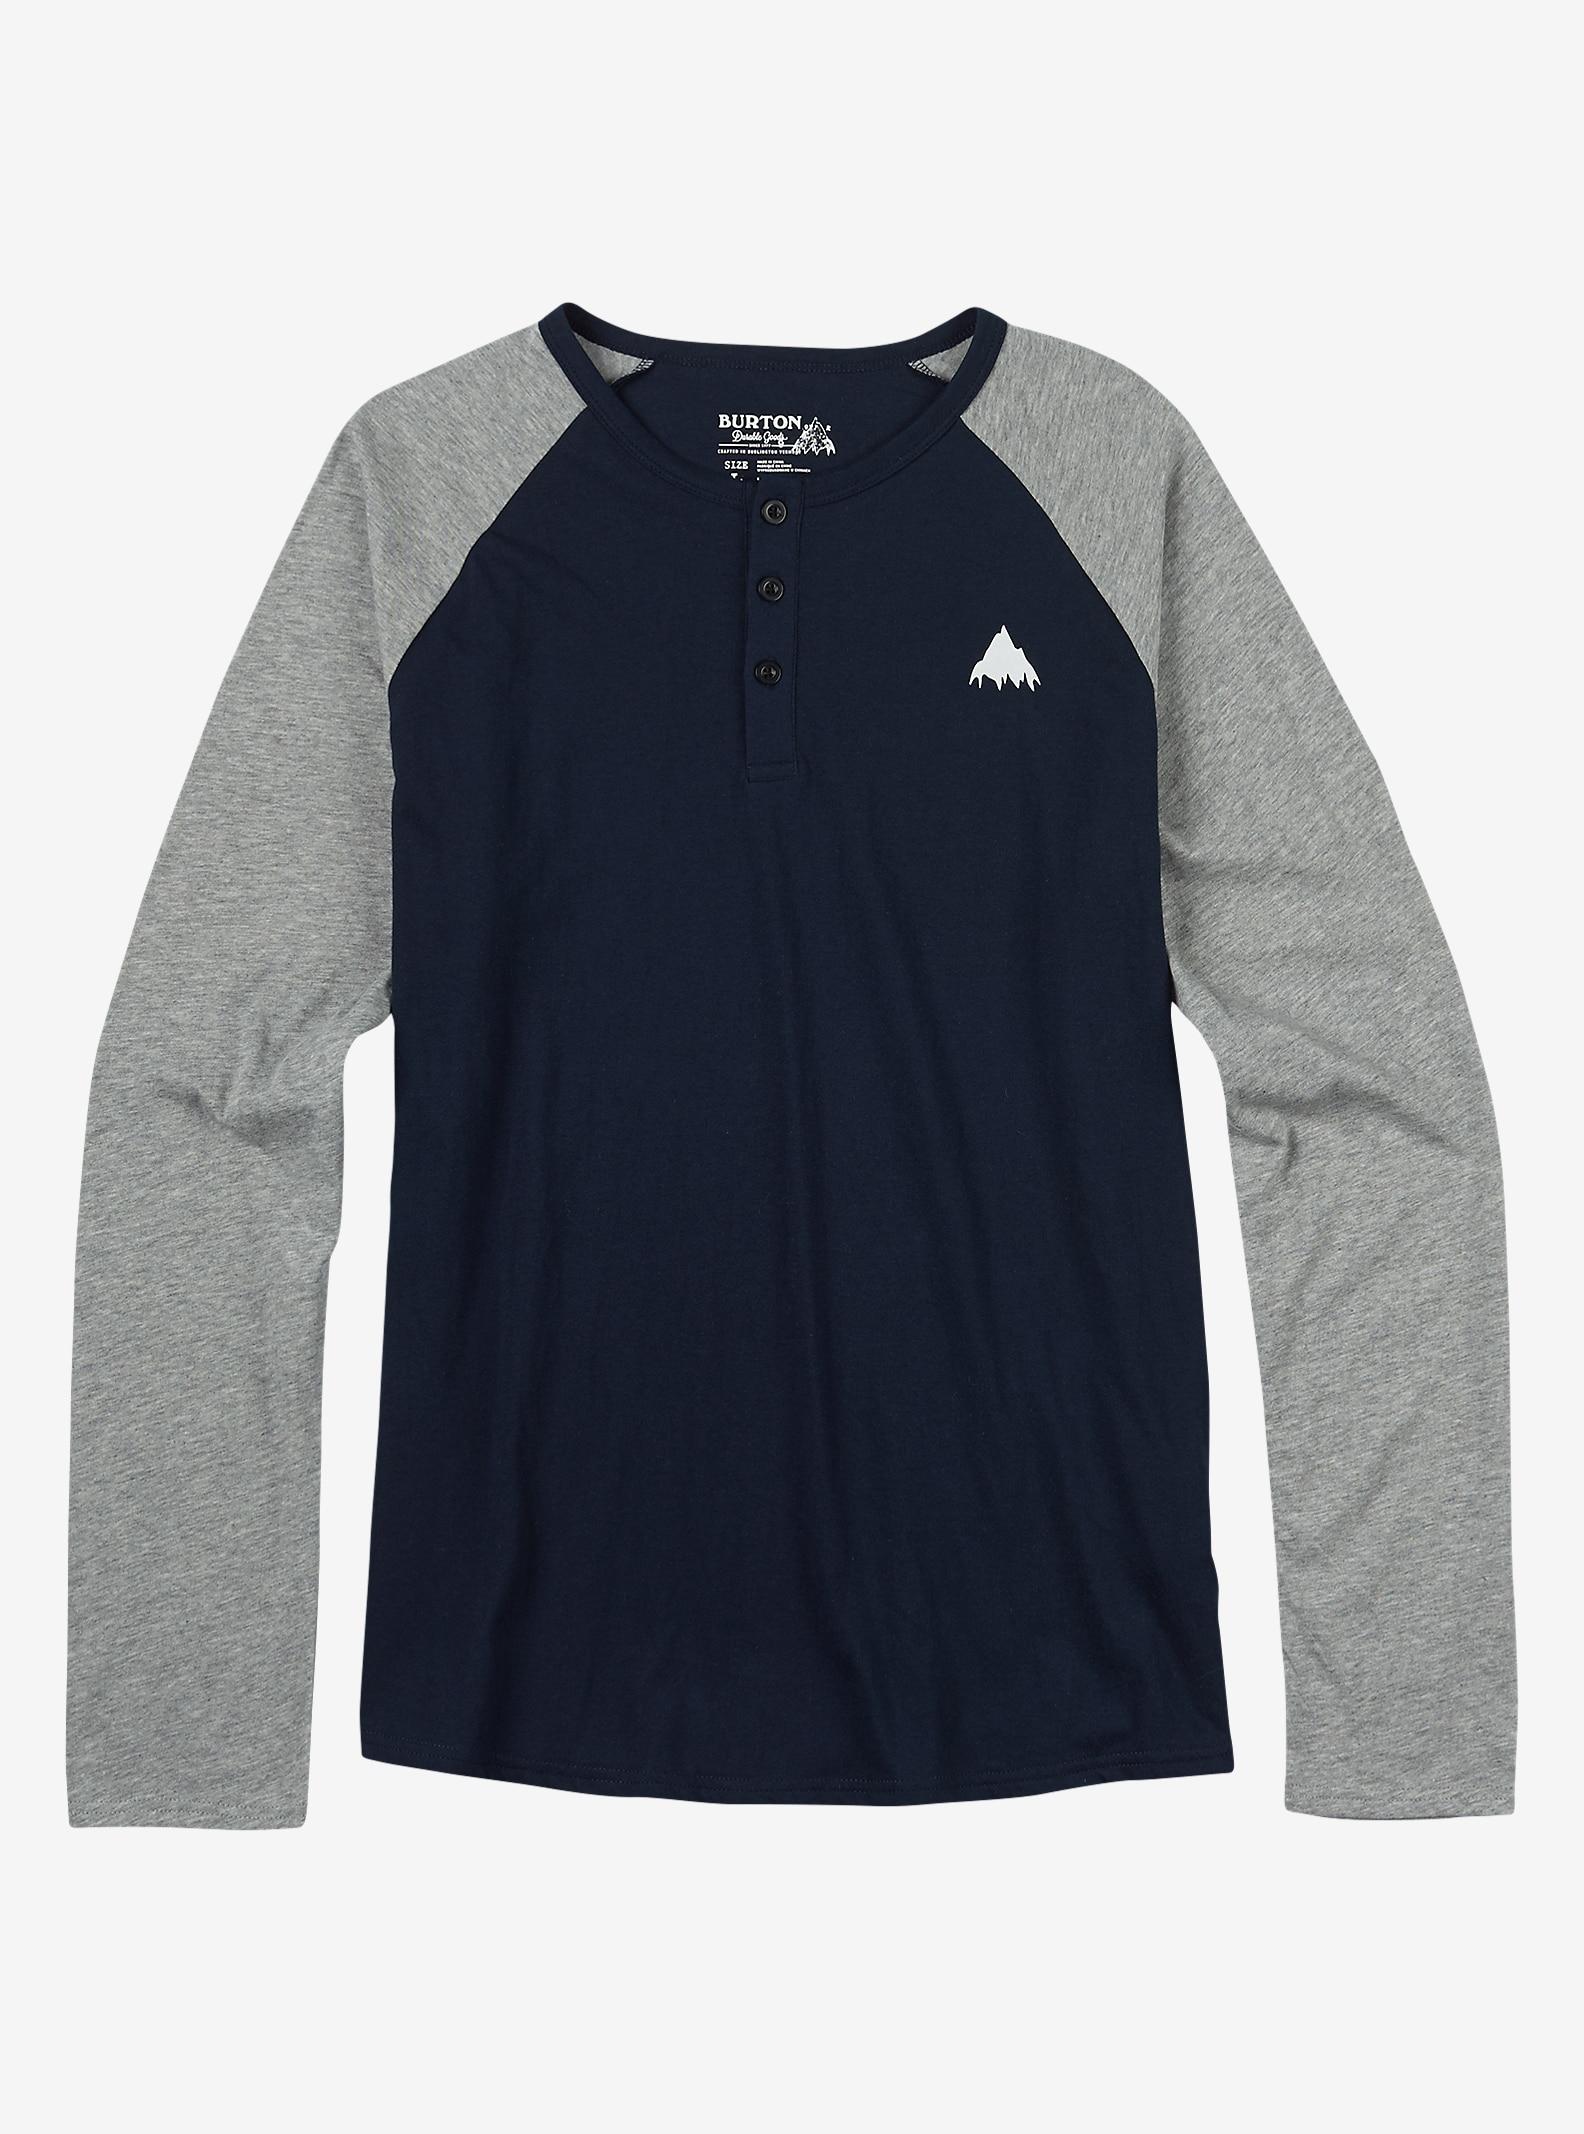 Burton Lifty Henley Shirt shown in Eclipse